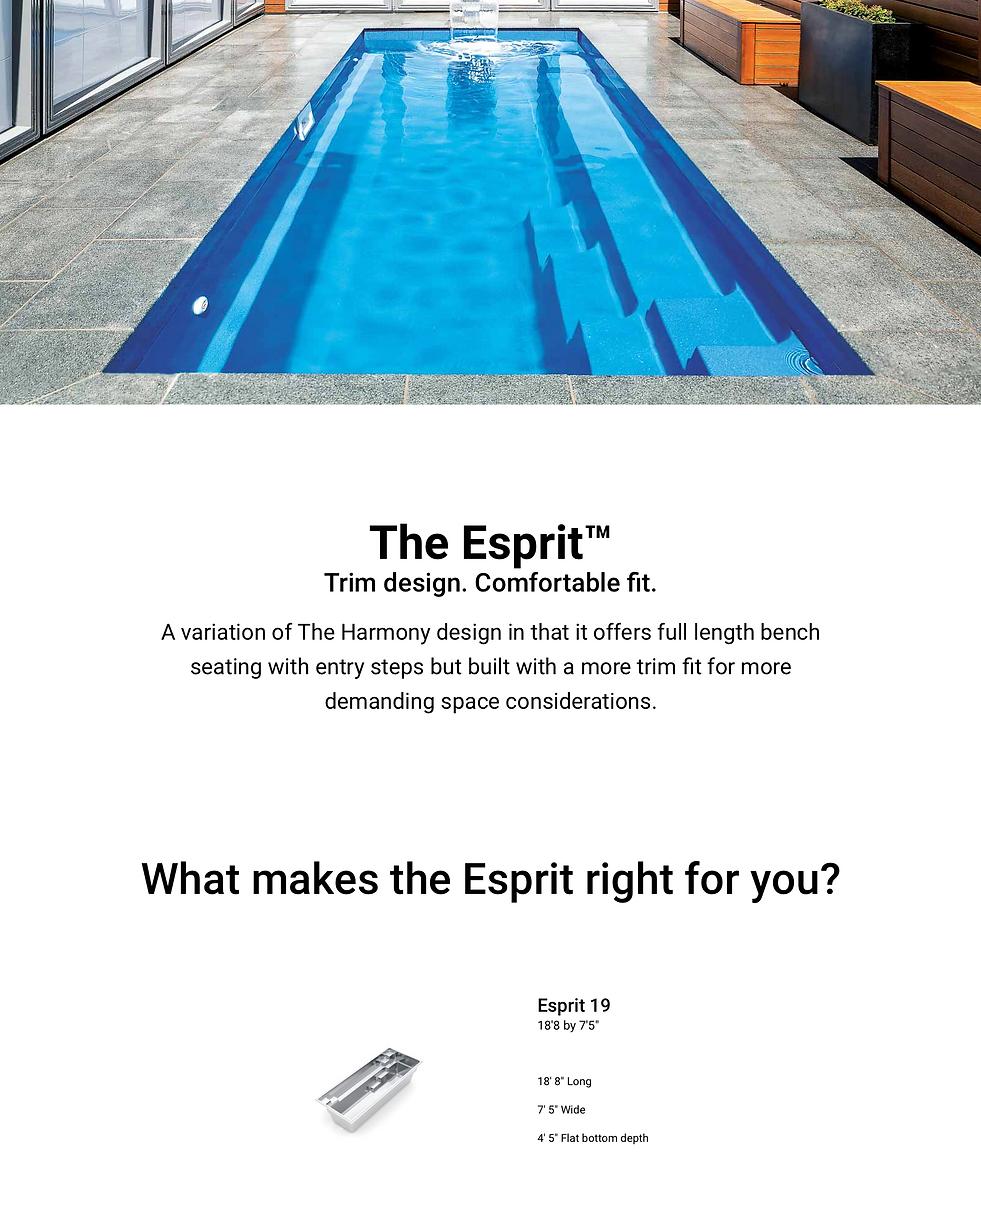 The Esprit Design.png